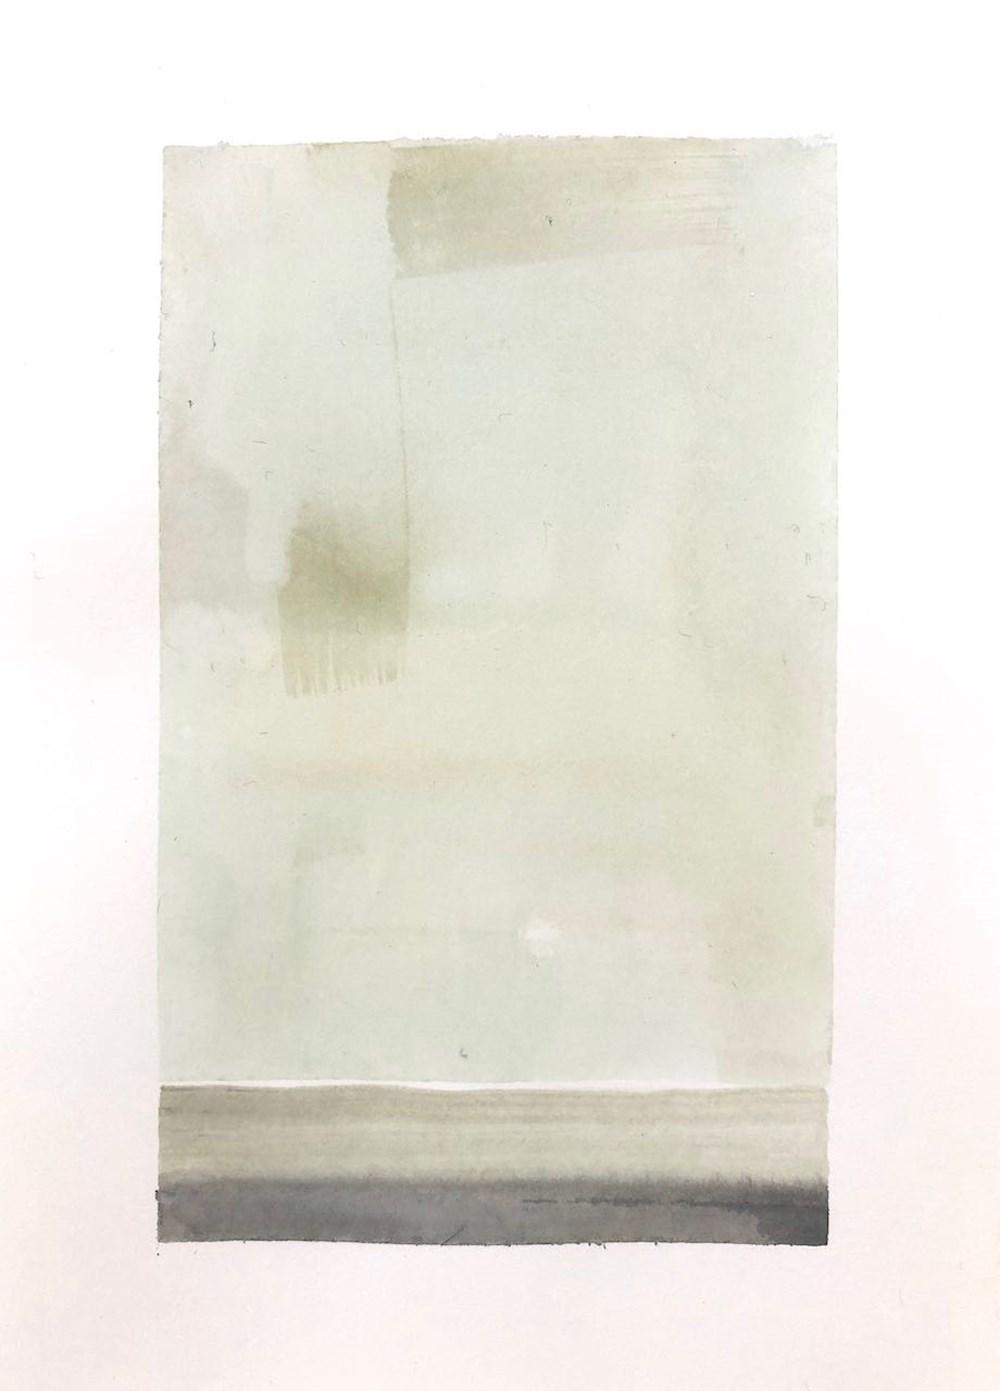 Life on Venus | The Landscape, Live Auction - Lot 27, Stephanie Nebbia, Hayers